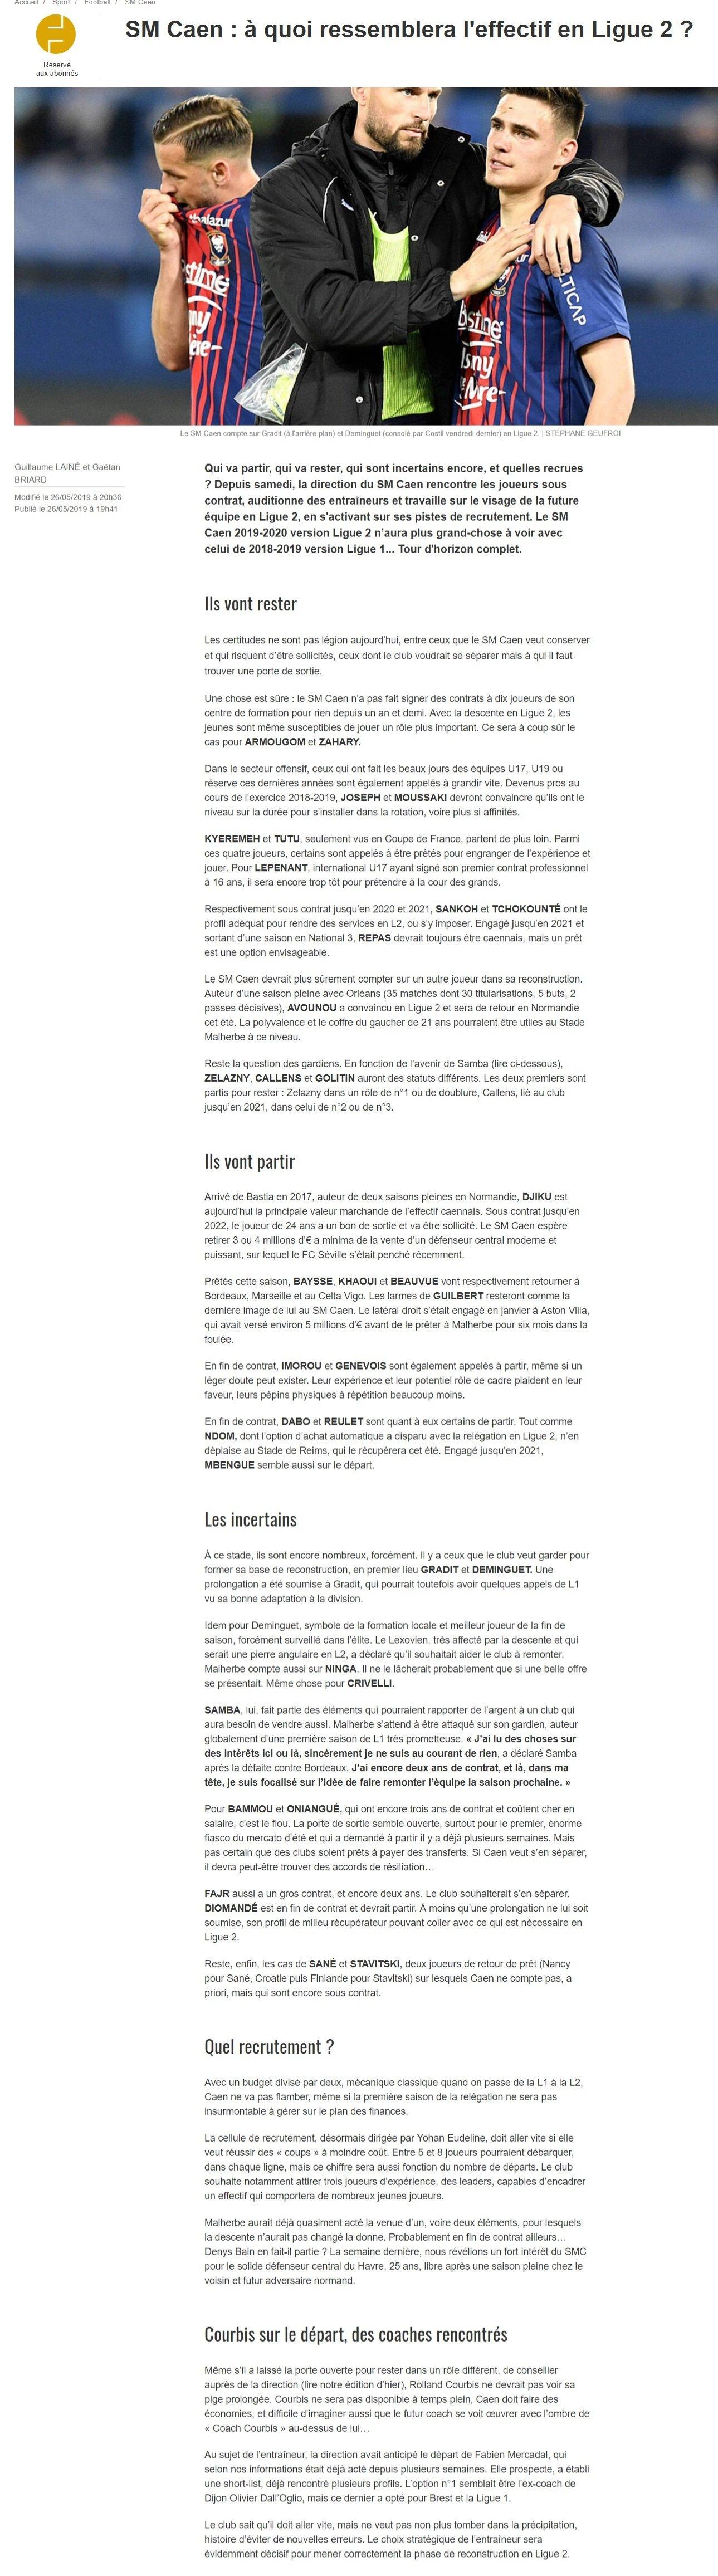 [Débat]Mercato 2019/2020 - Page 5 190526102533675050